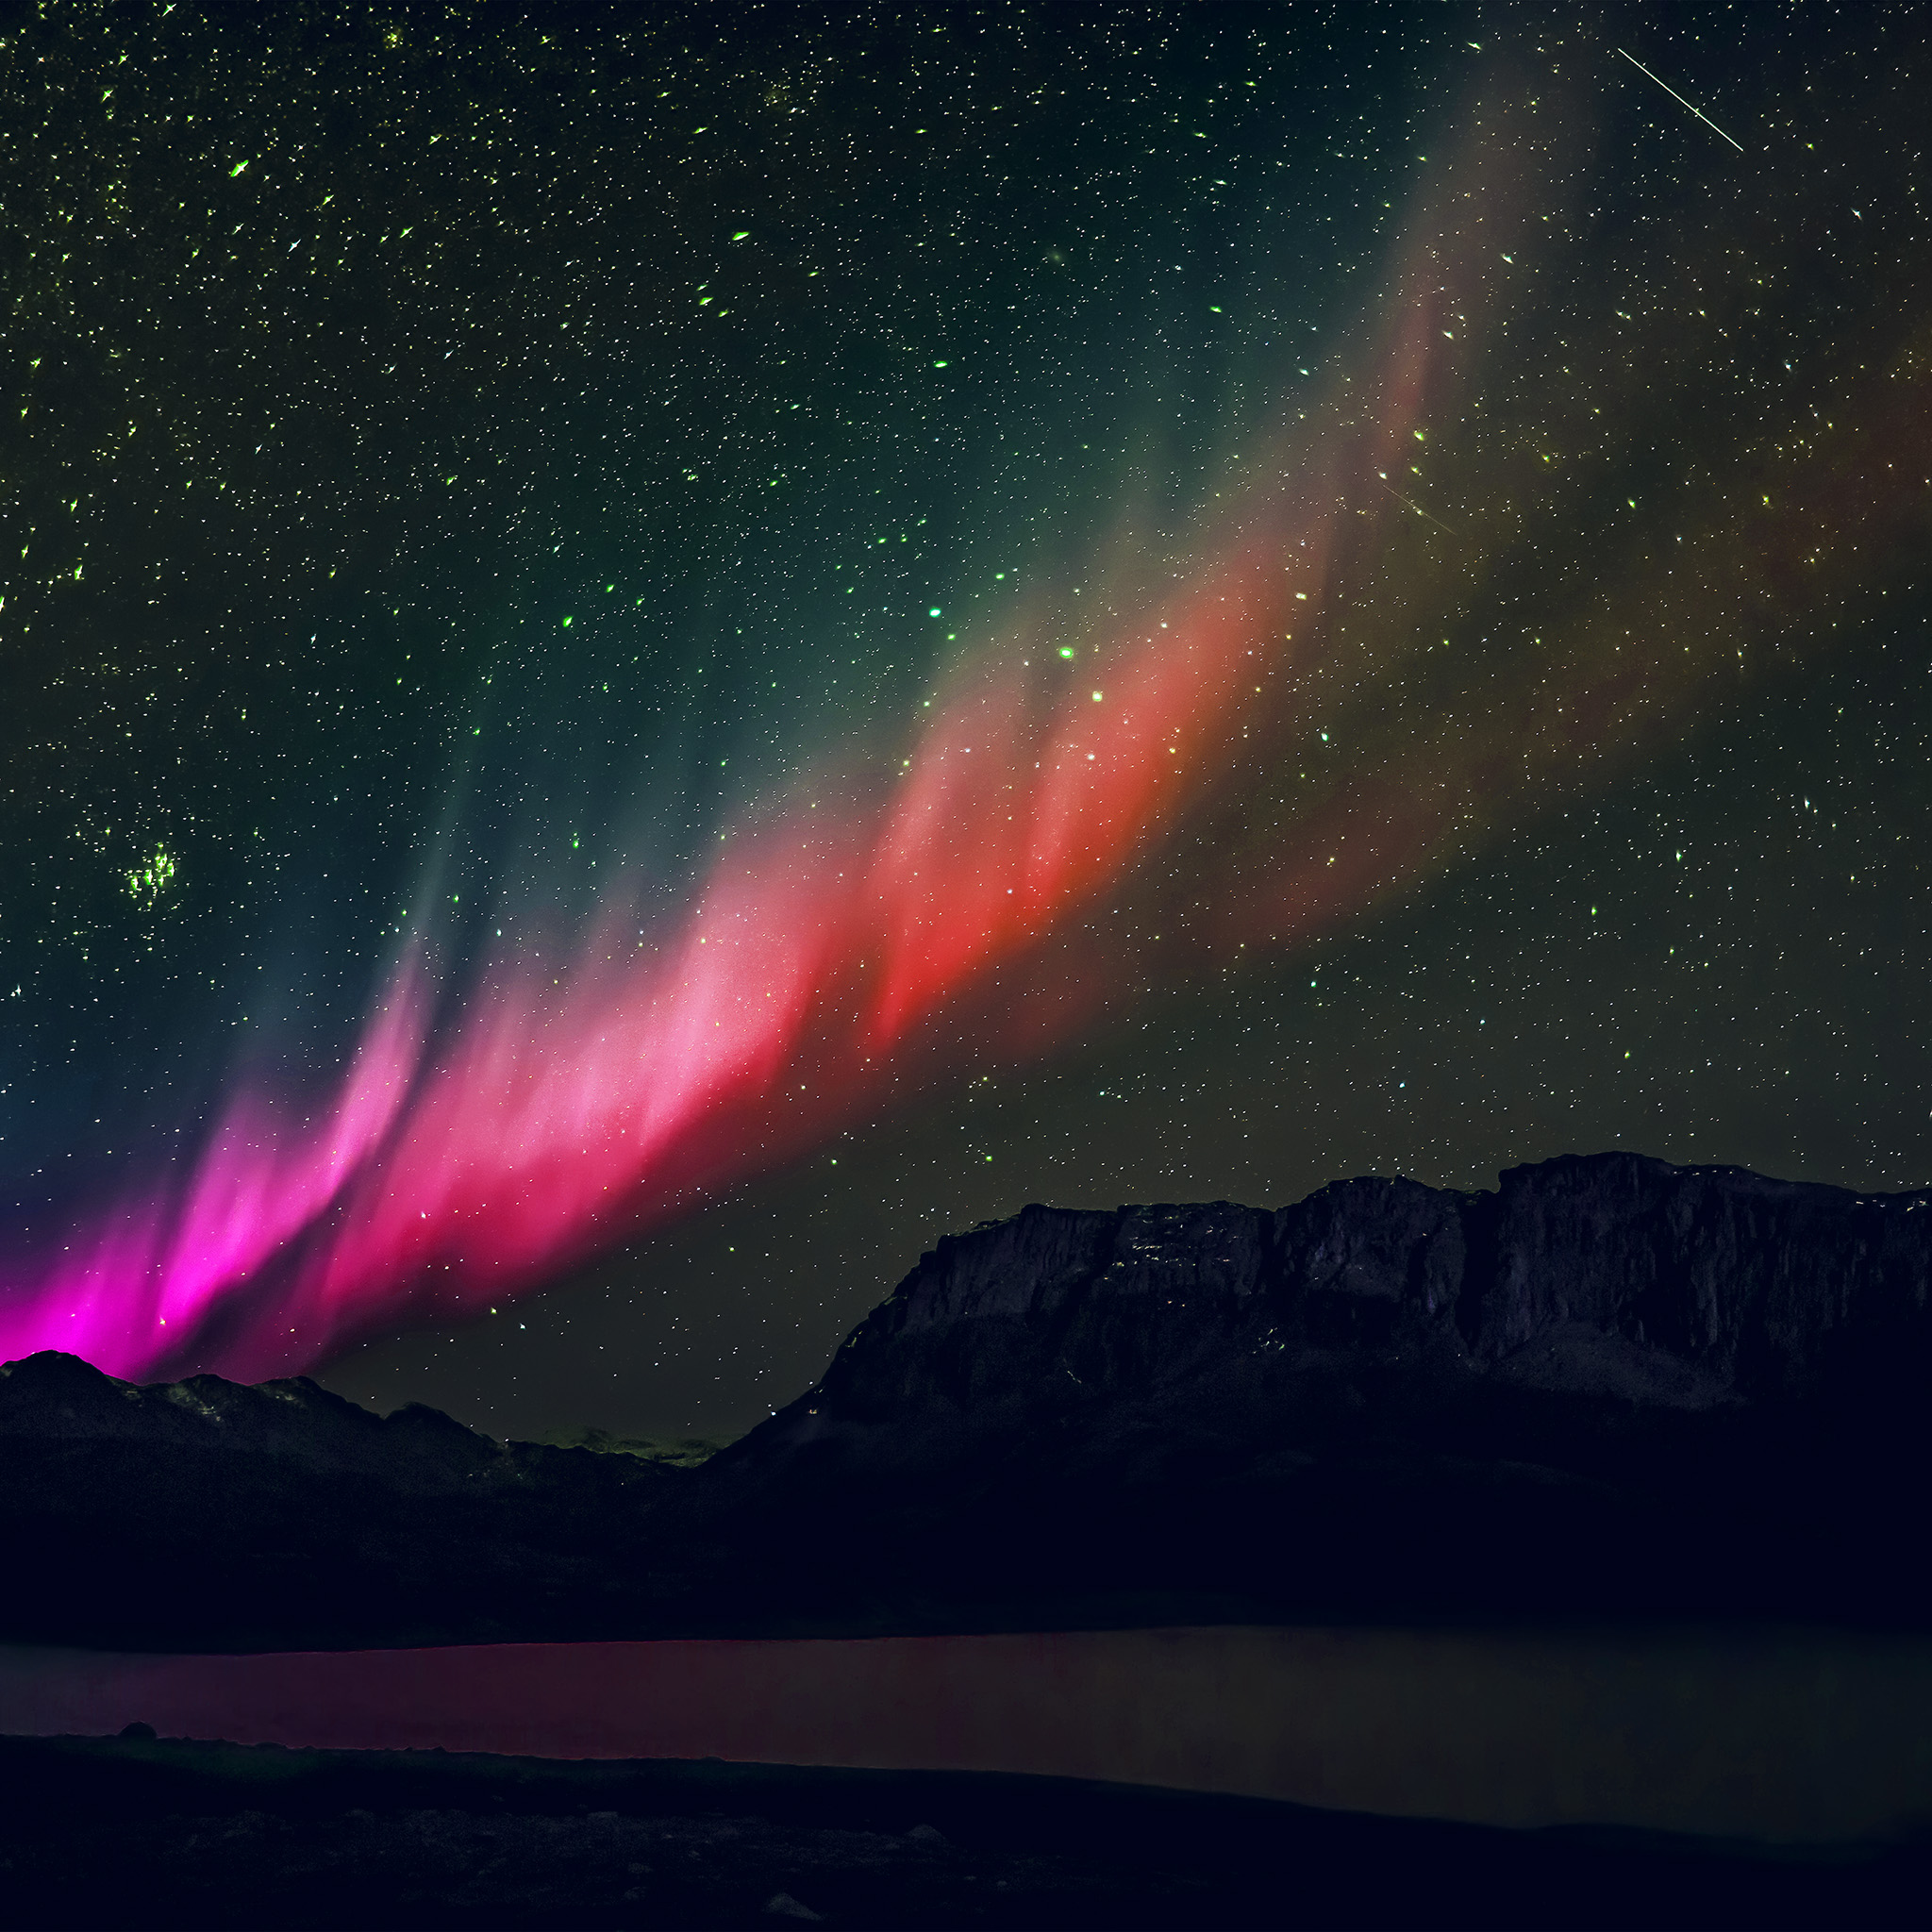 Wallpap: Nq53-aurora-night-sky-mountain-space-nature-rainbow-love